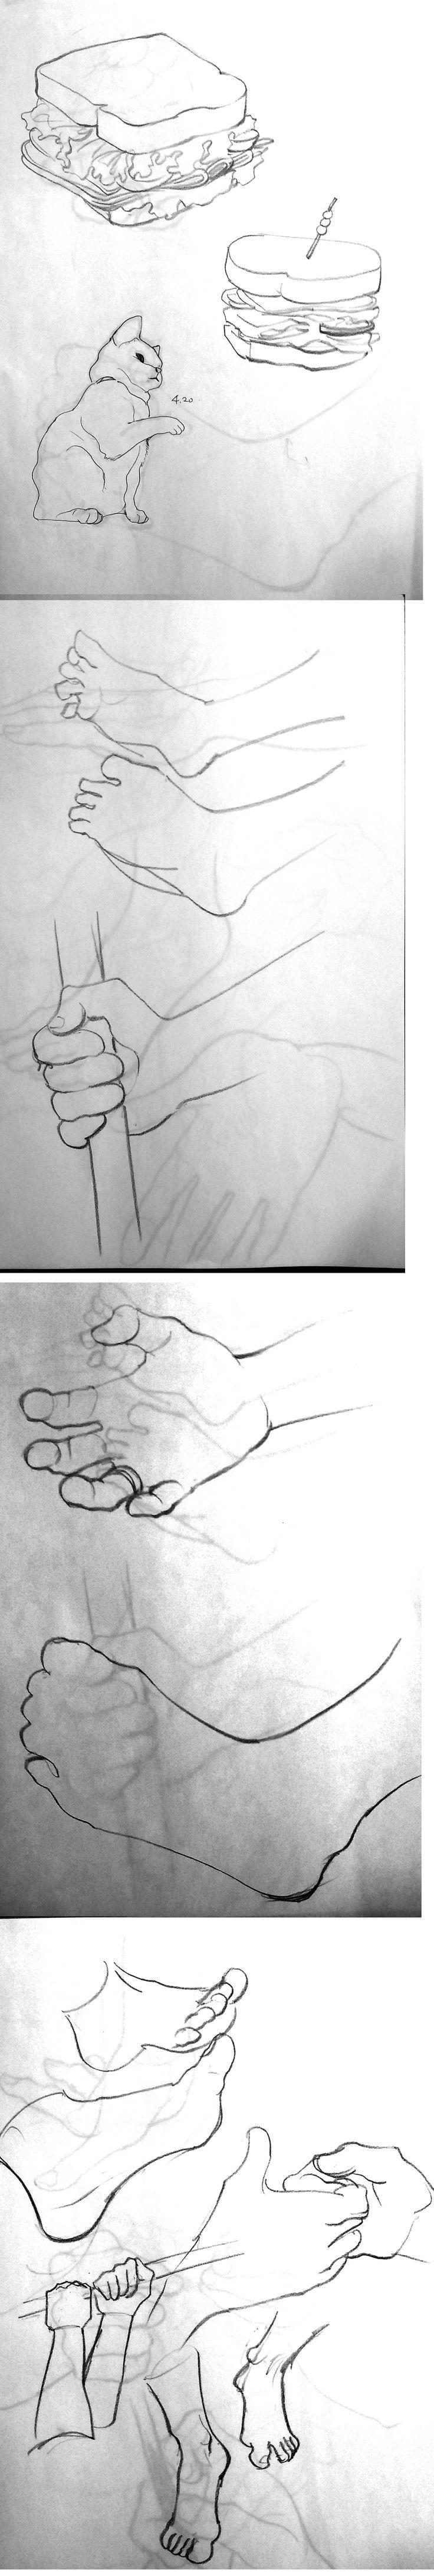 No.74~84 / 2min. Drawings / ref : artist.pixelovely.com